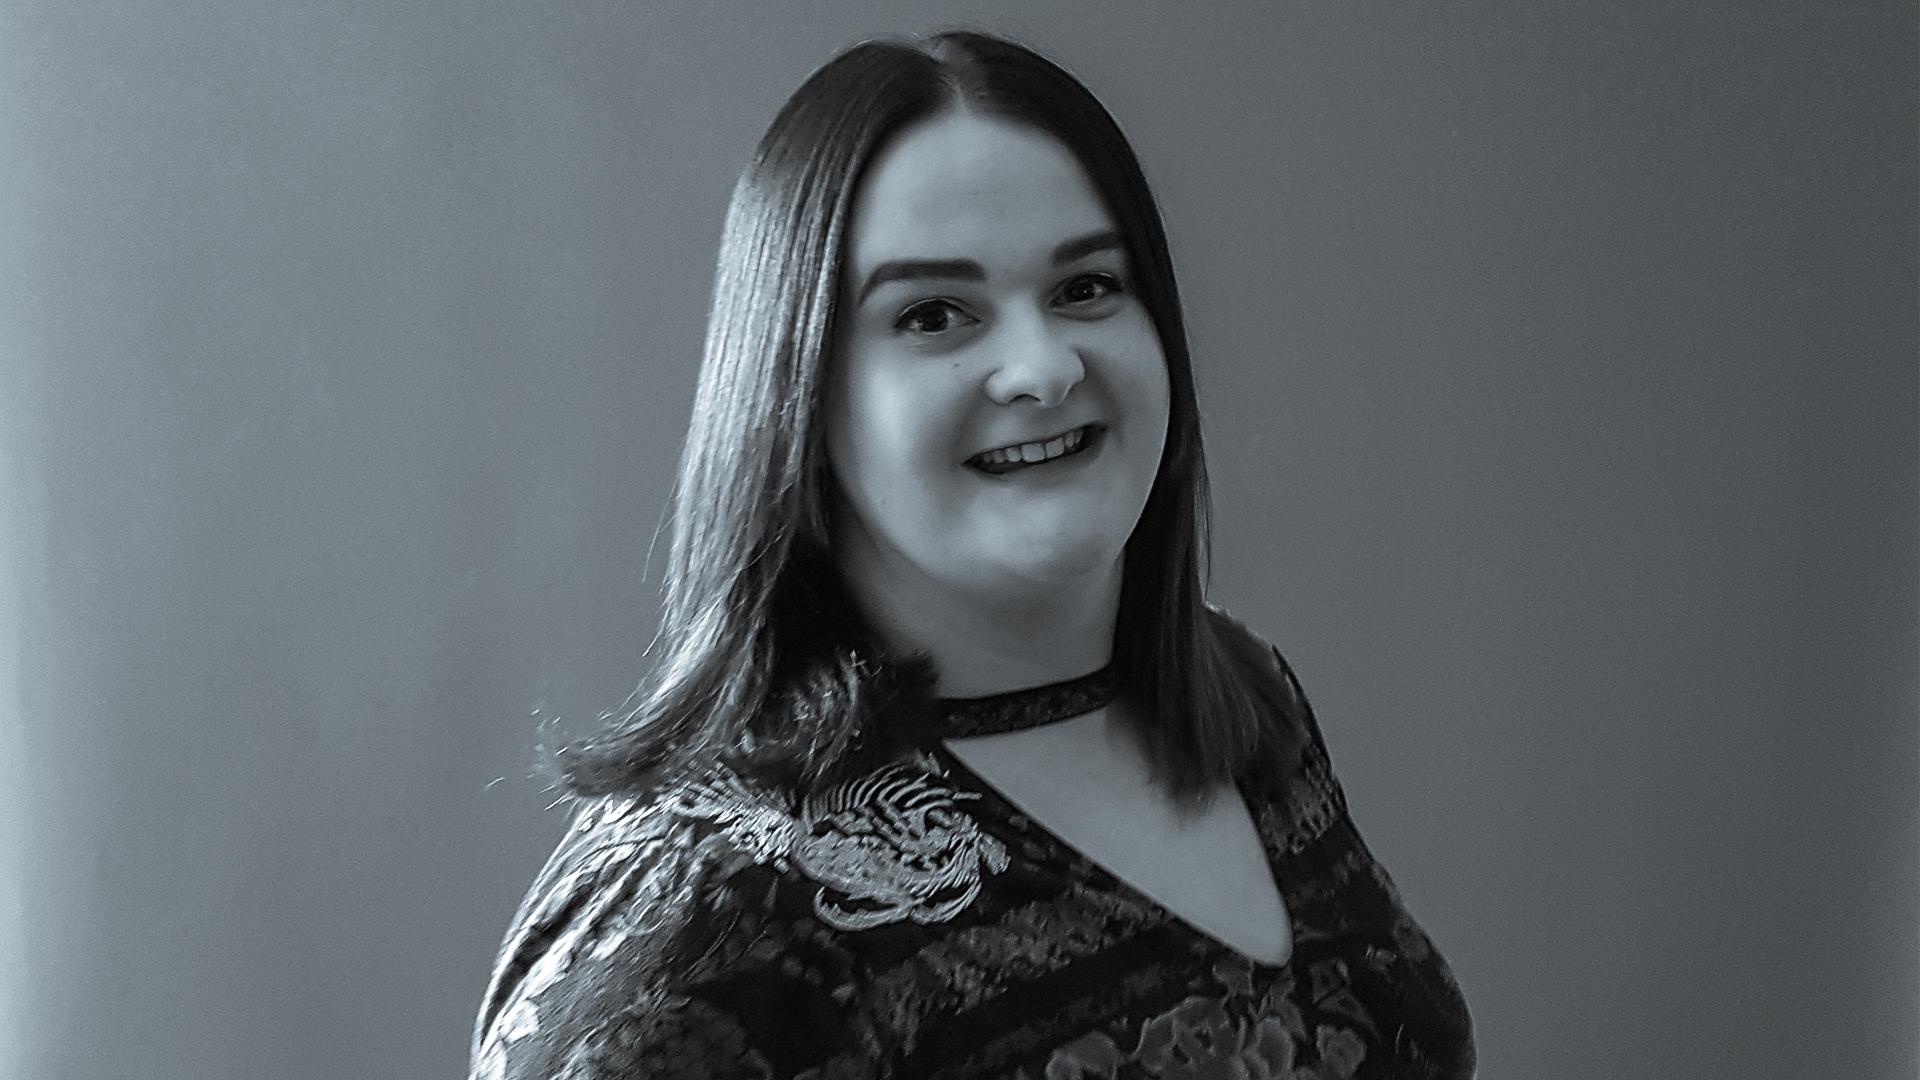 Jillian Ogilvie